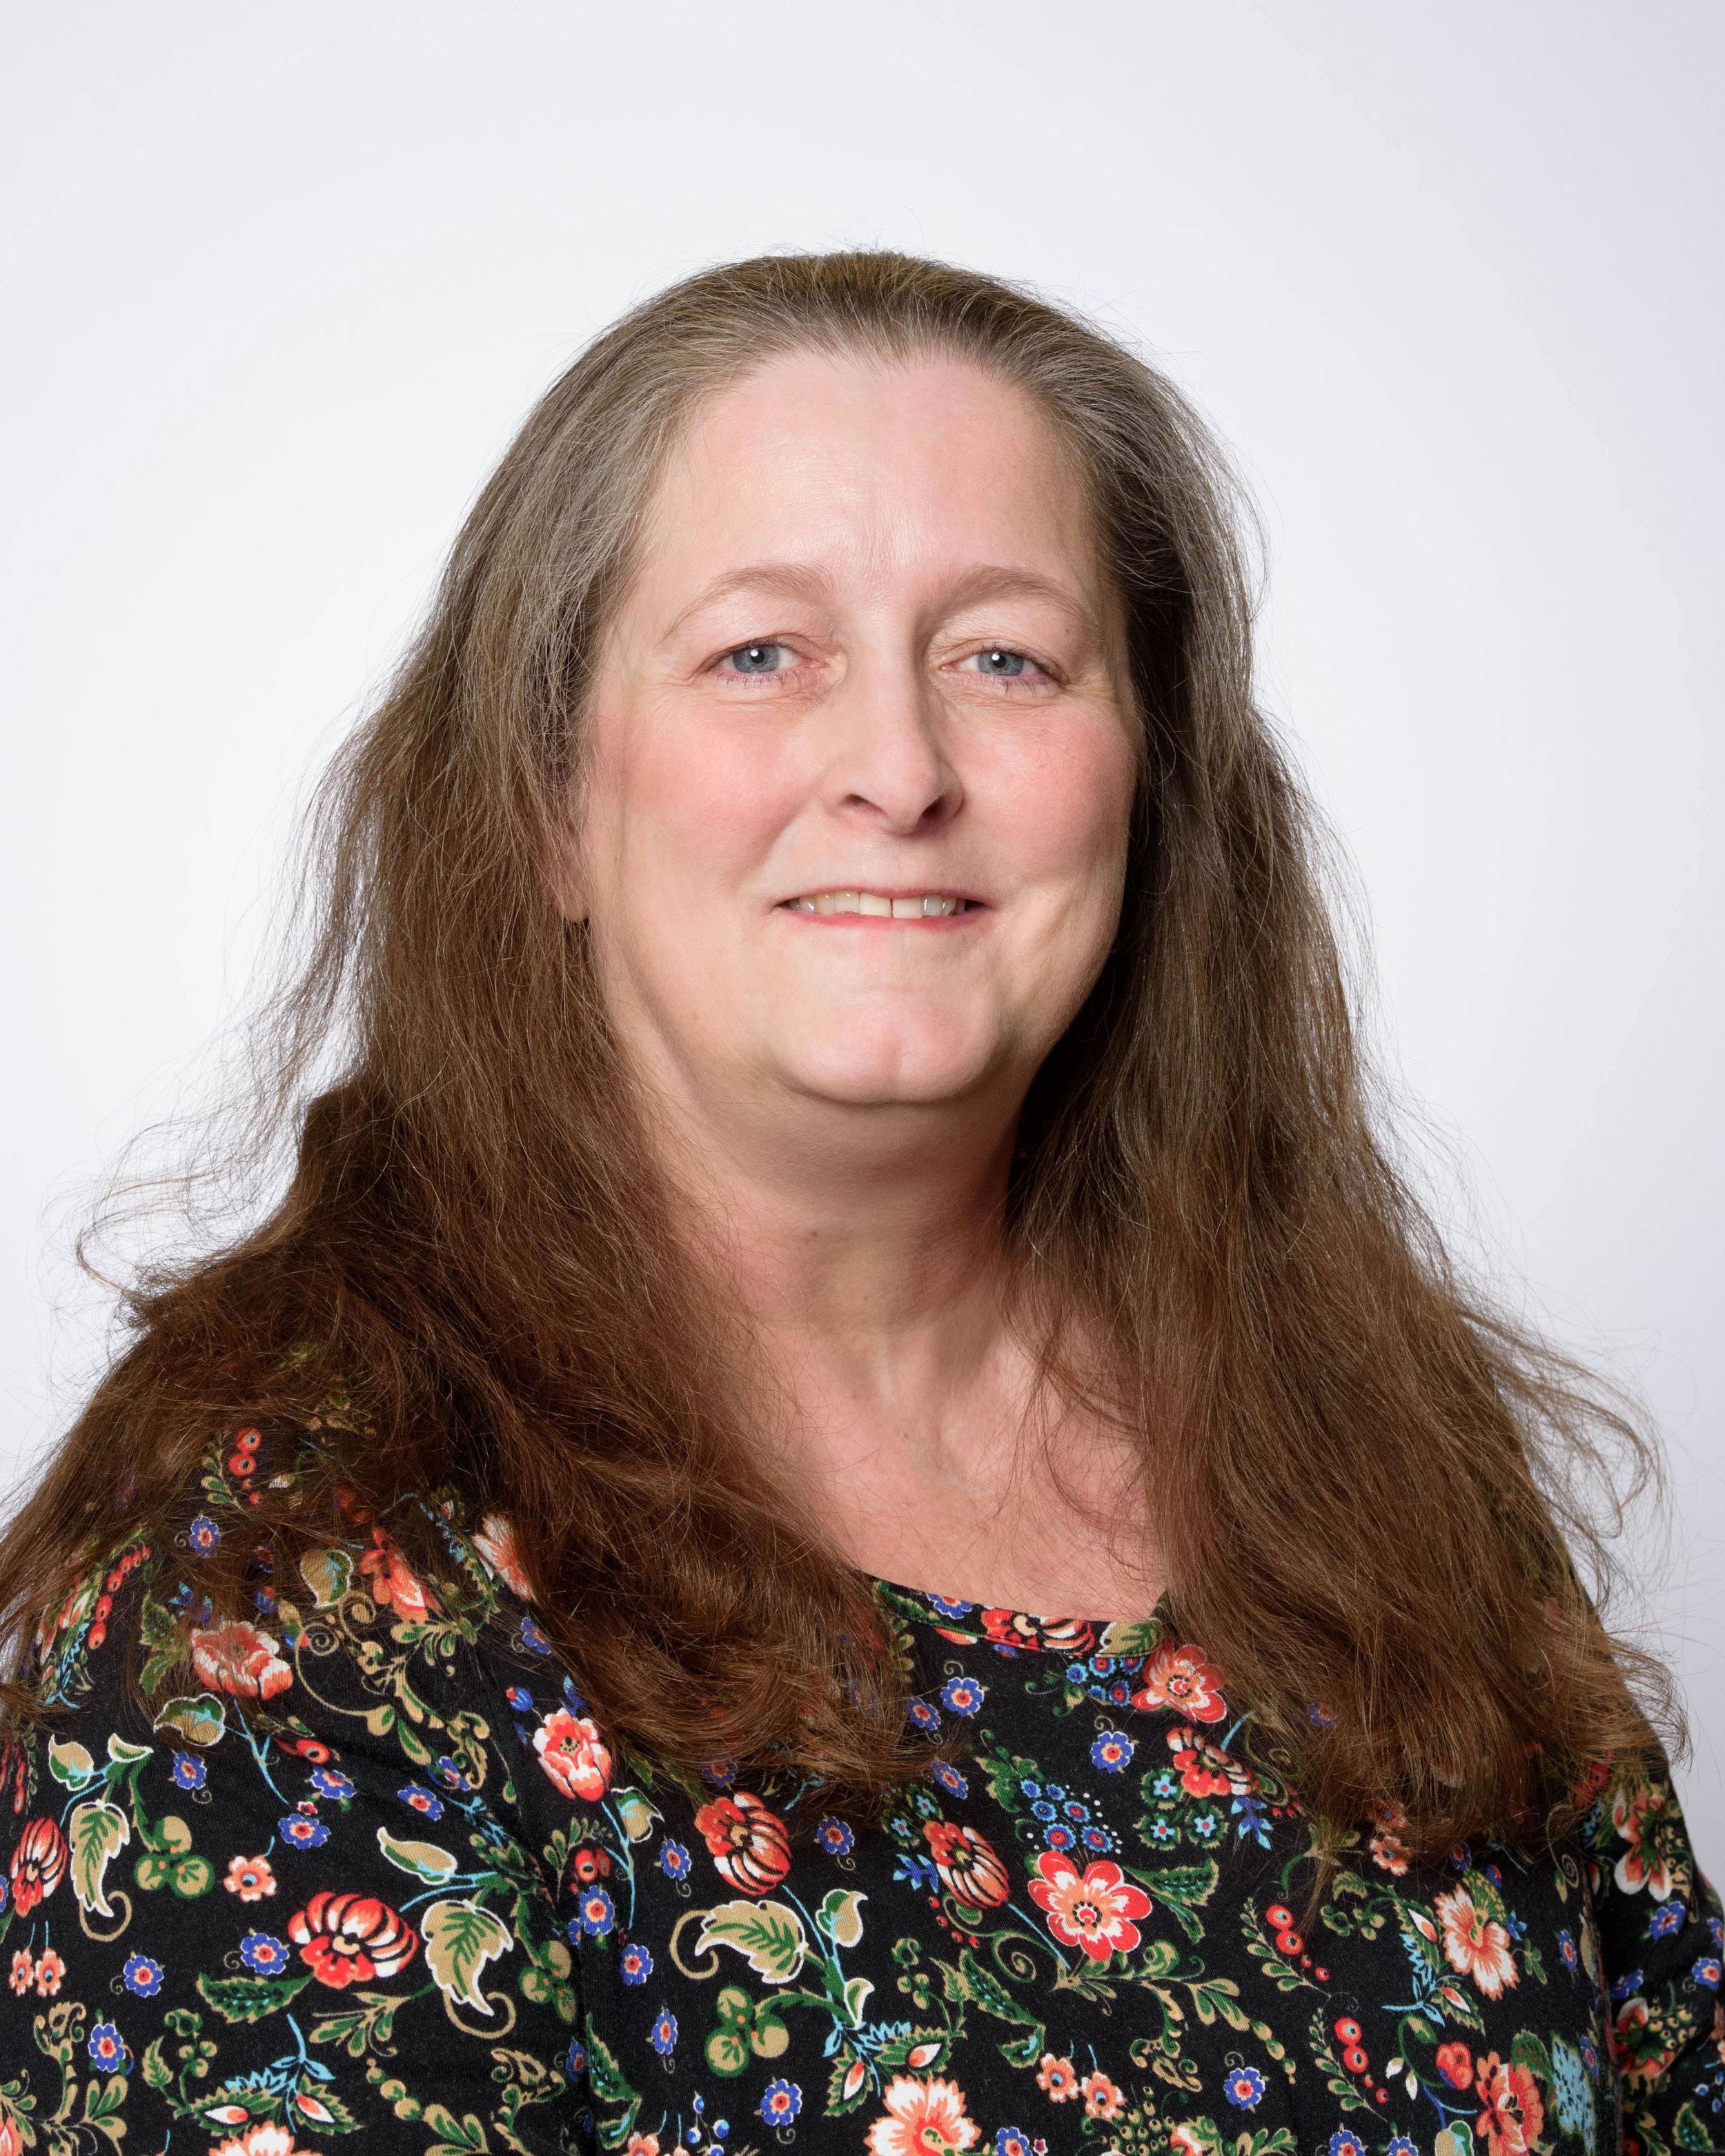 Anneke Waling